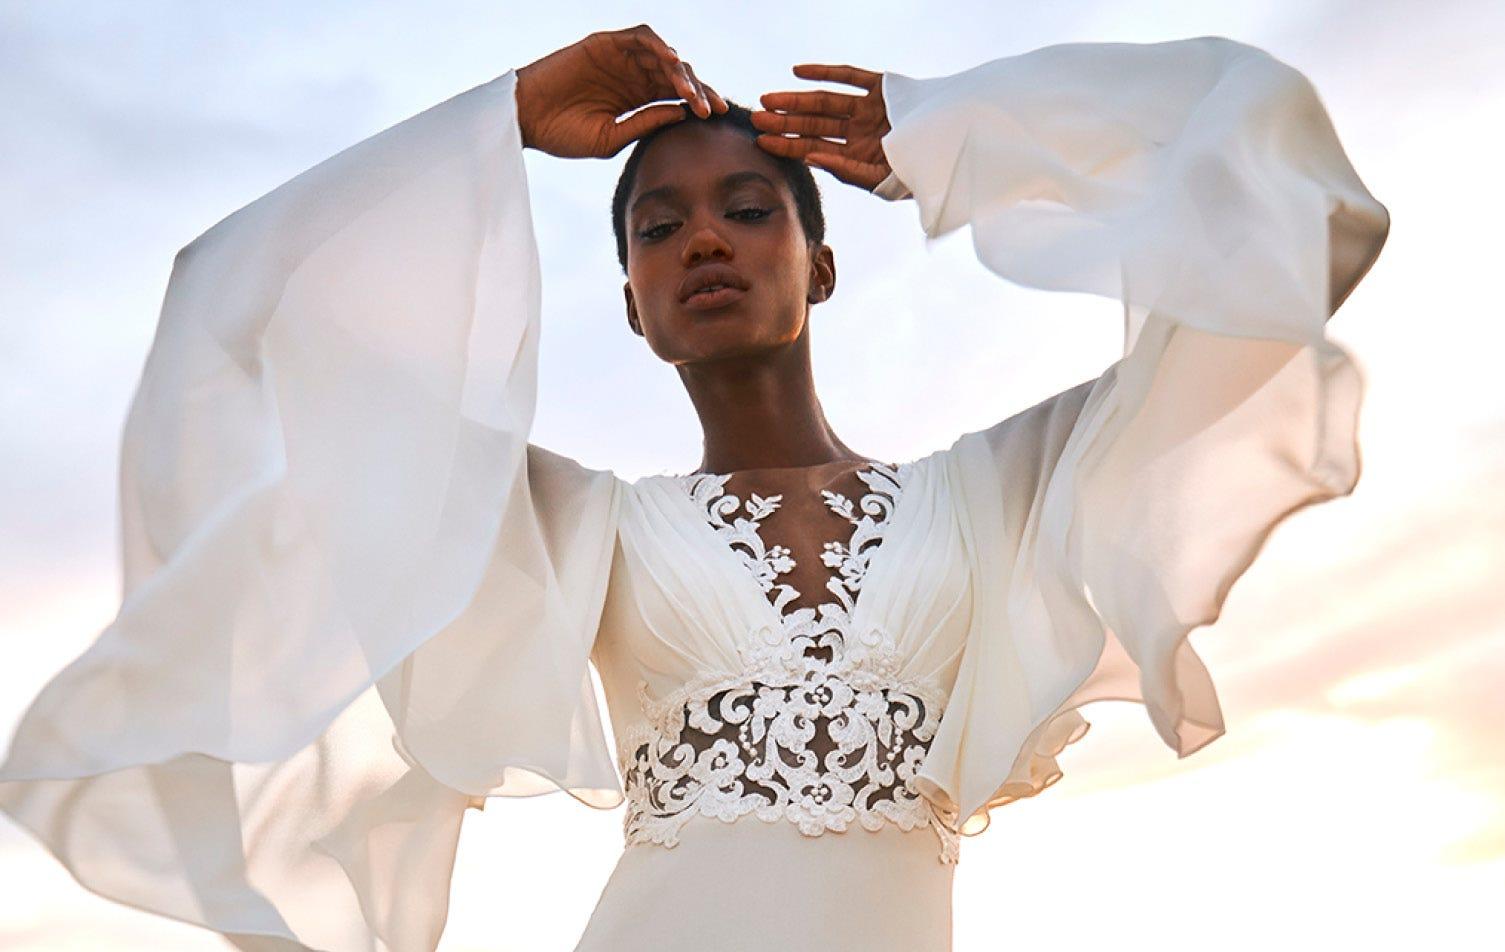 Pronovias 2022. A Rebirth of Bridal Glamor